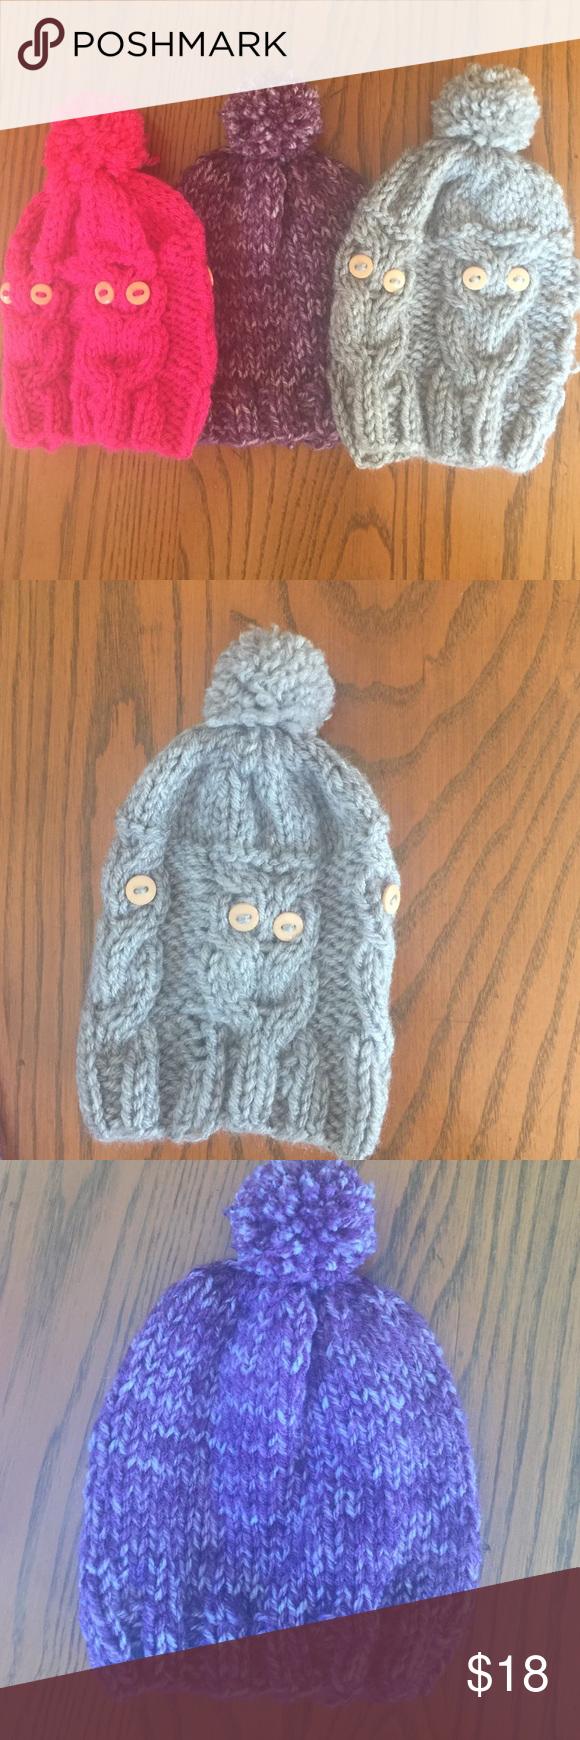 Handmade hats! Handmade hat! 0-3 months & 3-6 months bundle of three girls hats! Accessories Hats